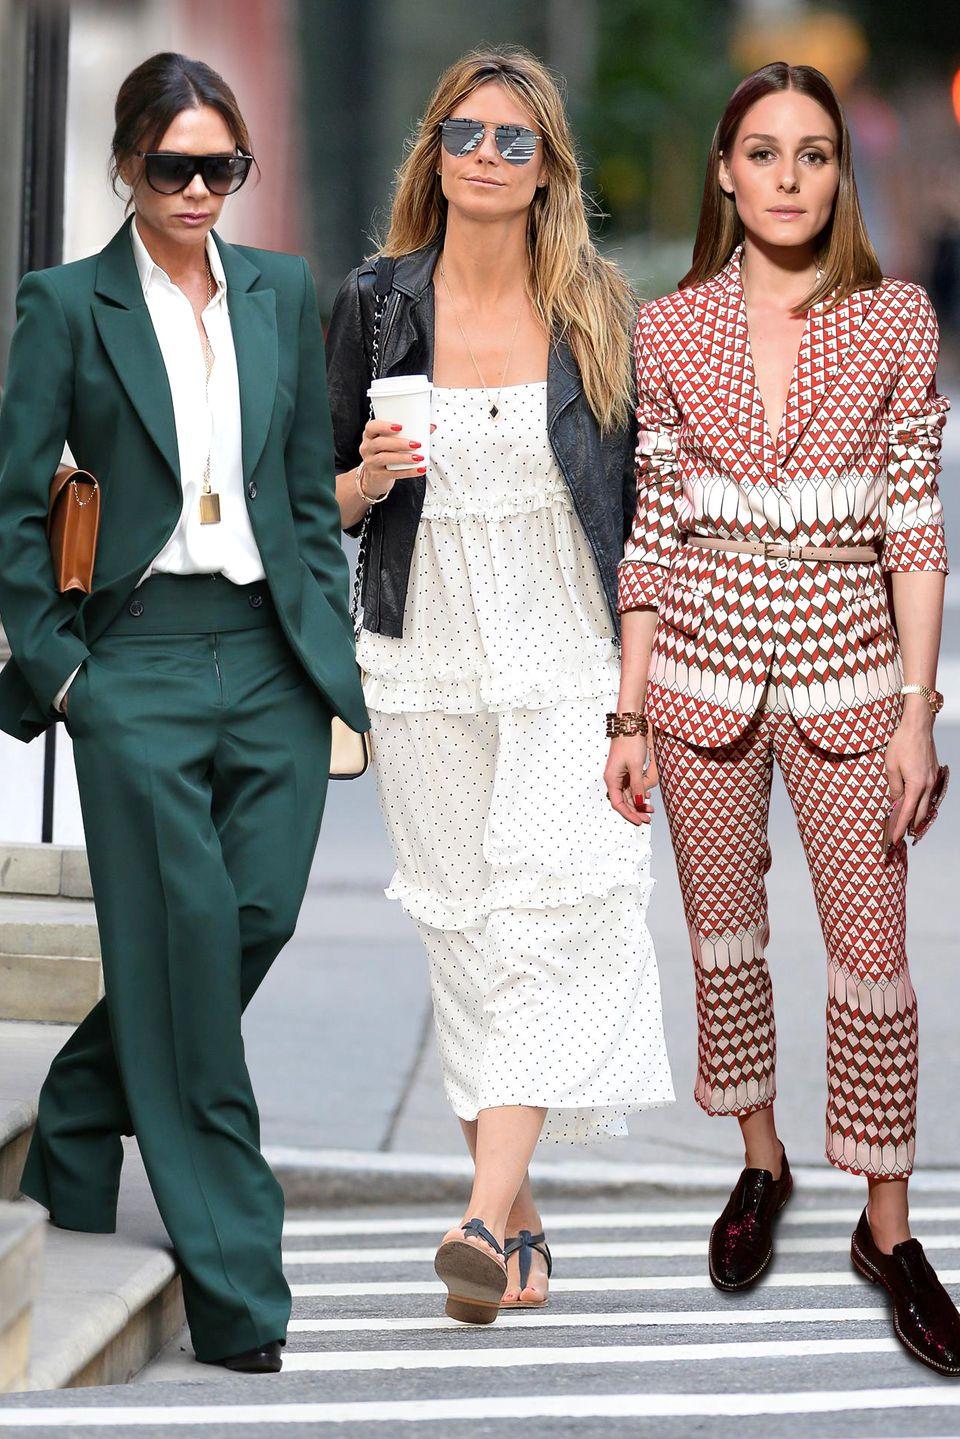 Victoria Beckham, Heidi Klum undOlivia Palermo